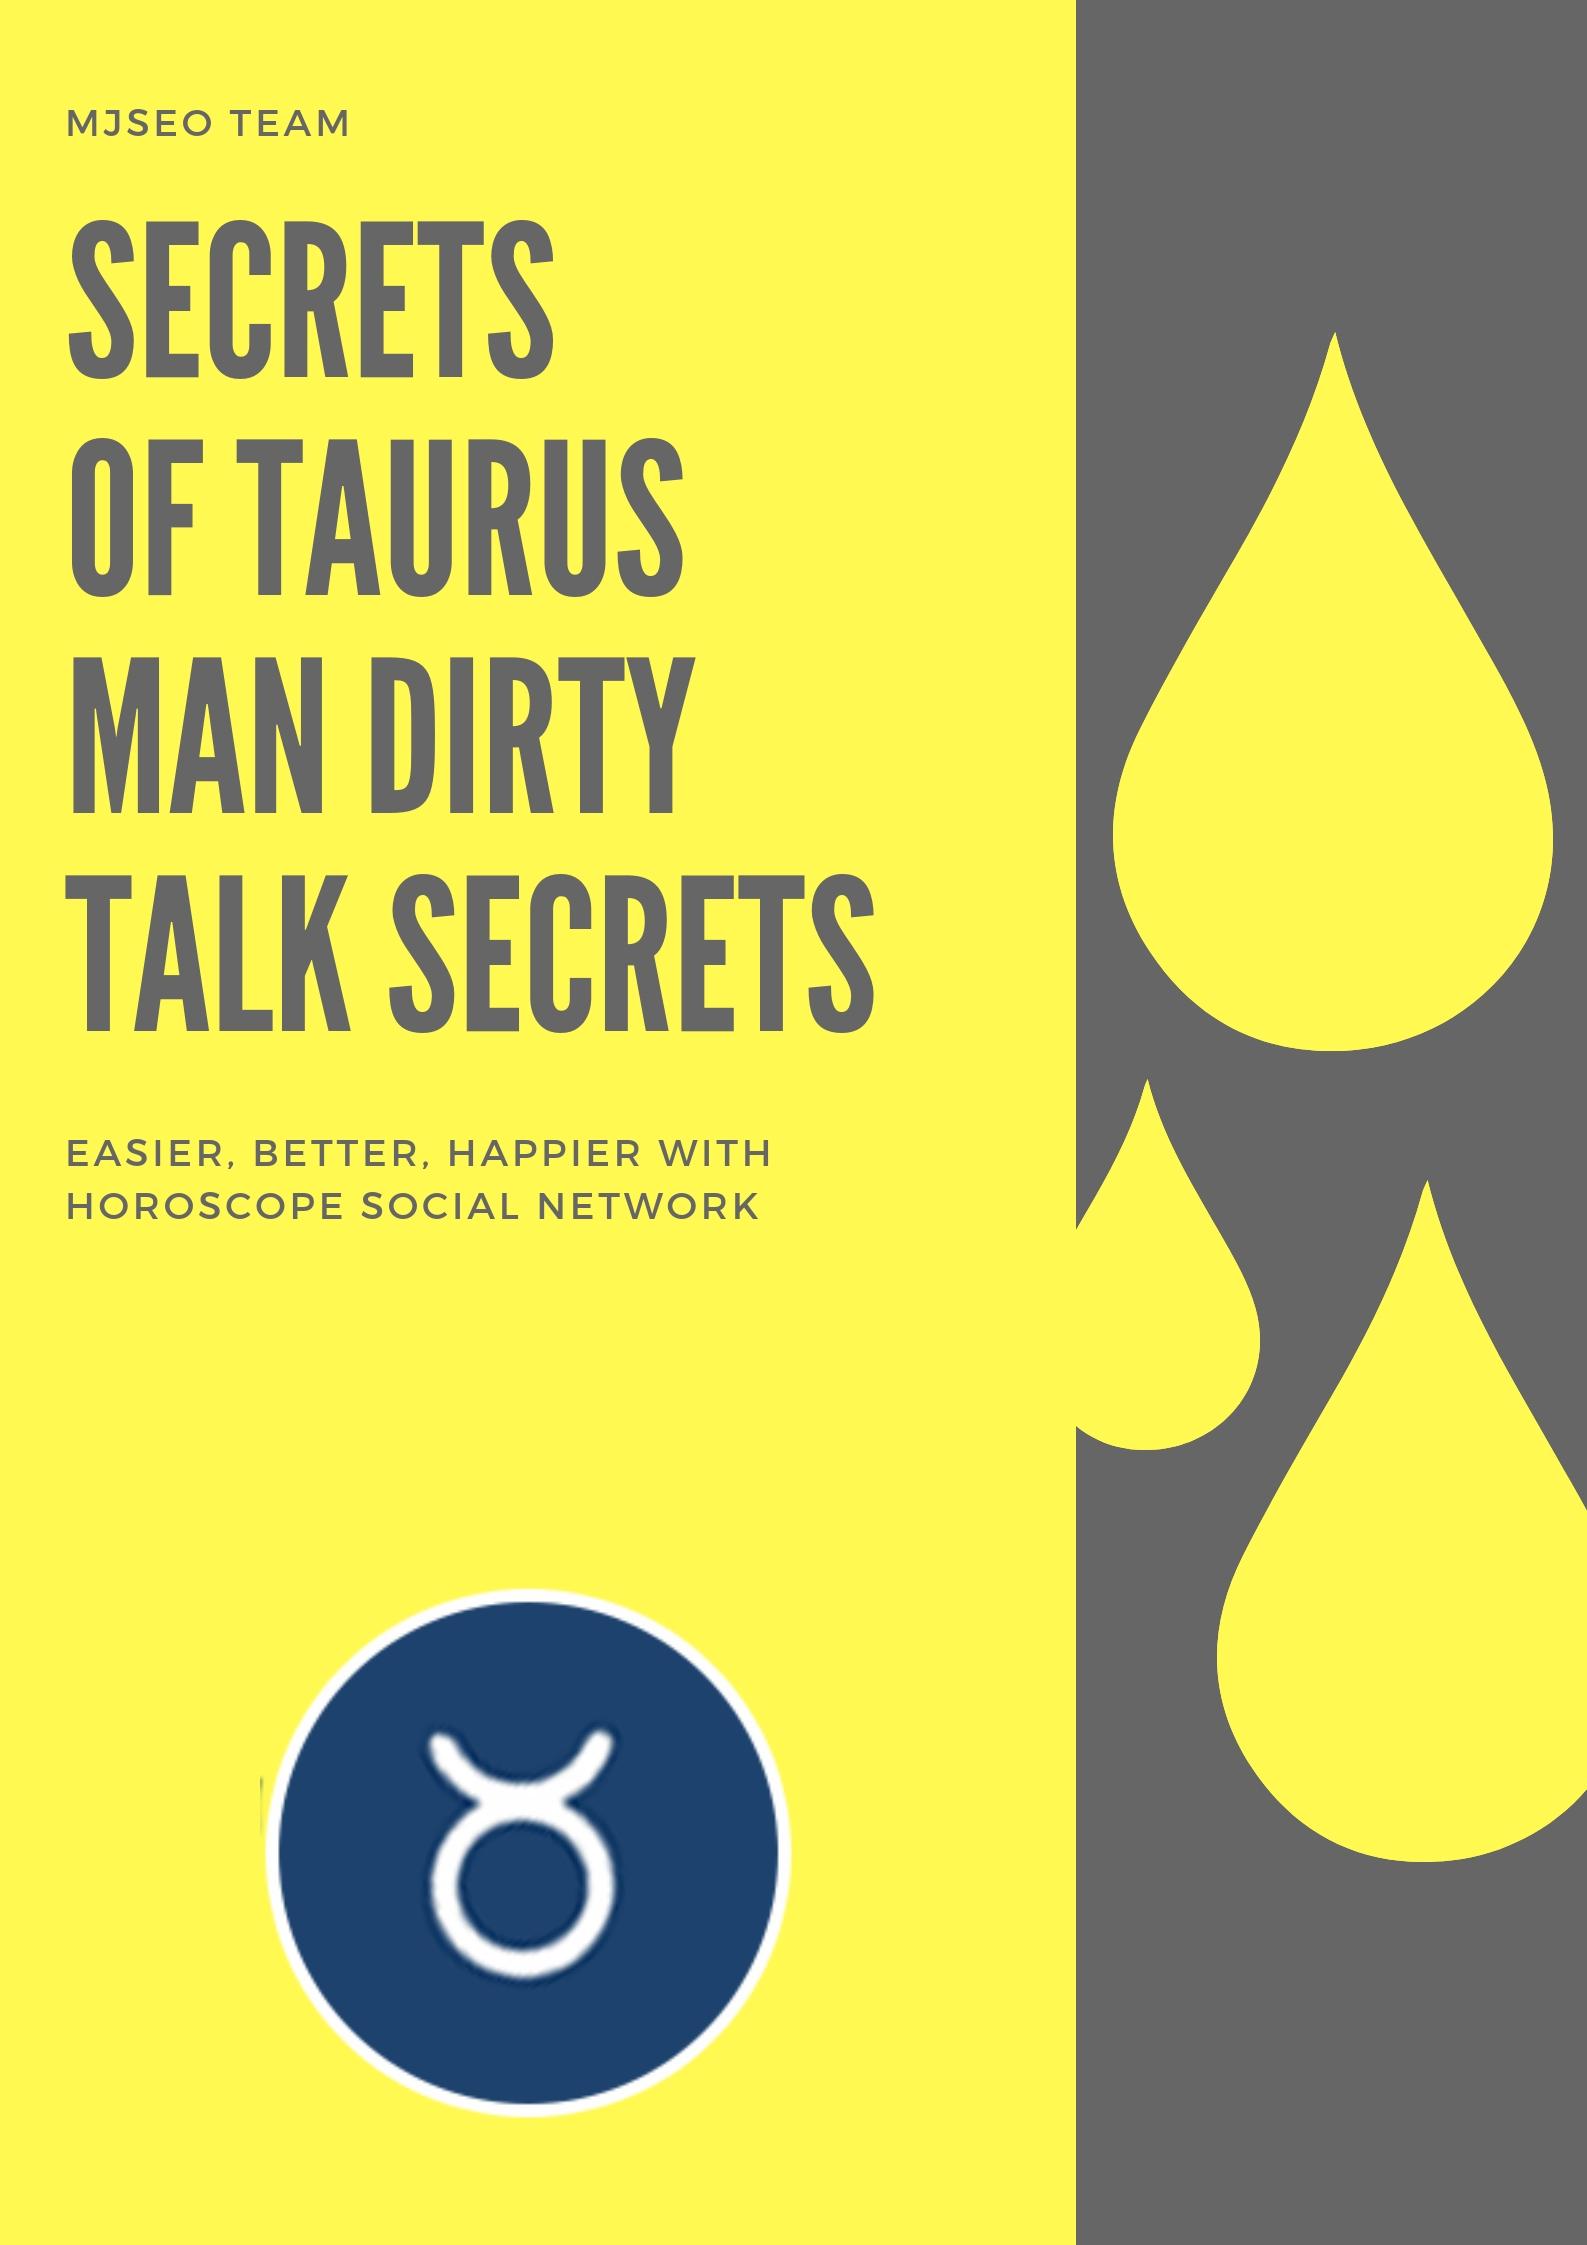 Secrets-Of-Taurus-Man-Dirty-Talk-Secrets